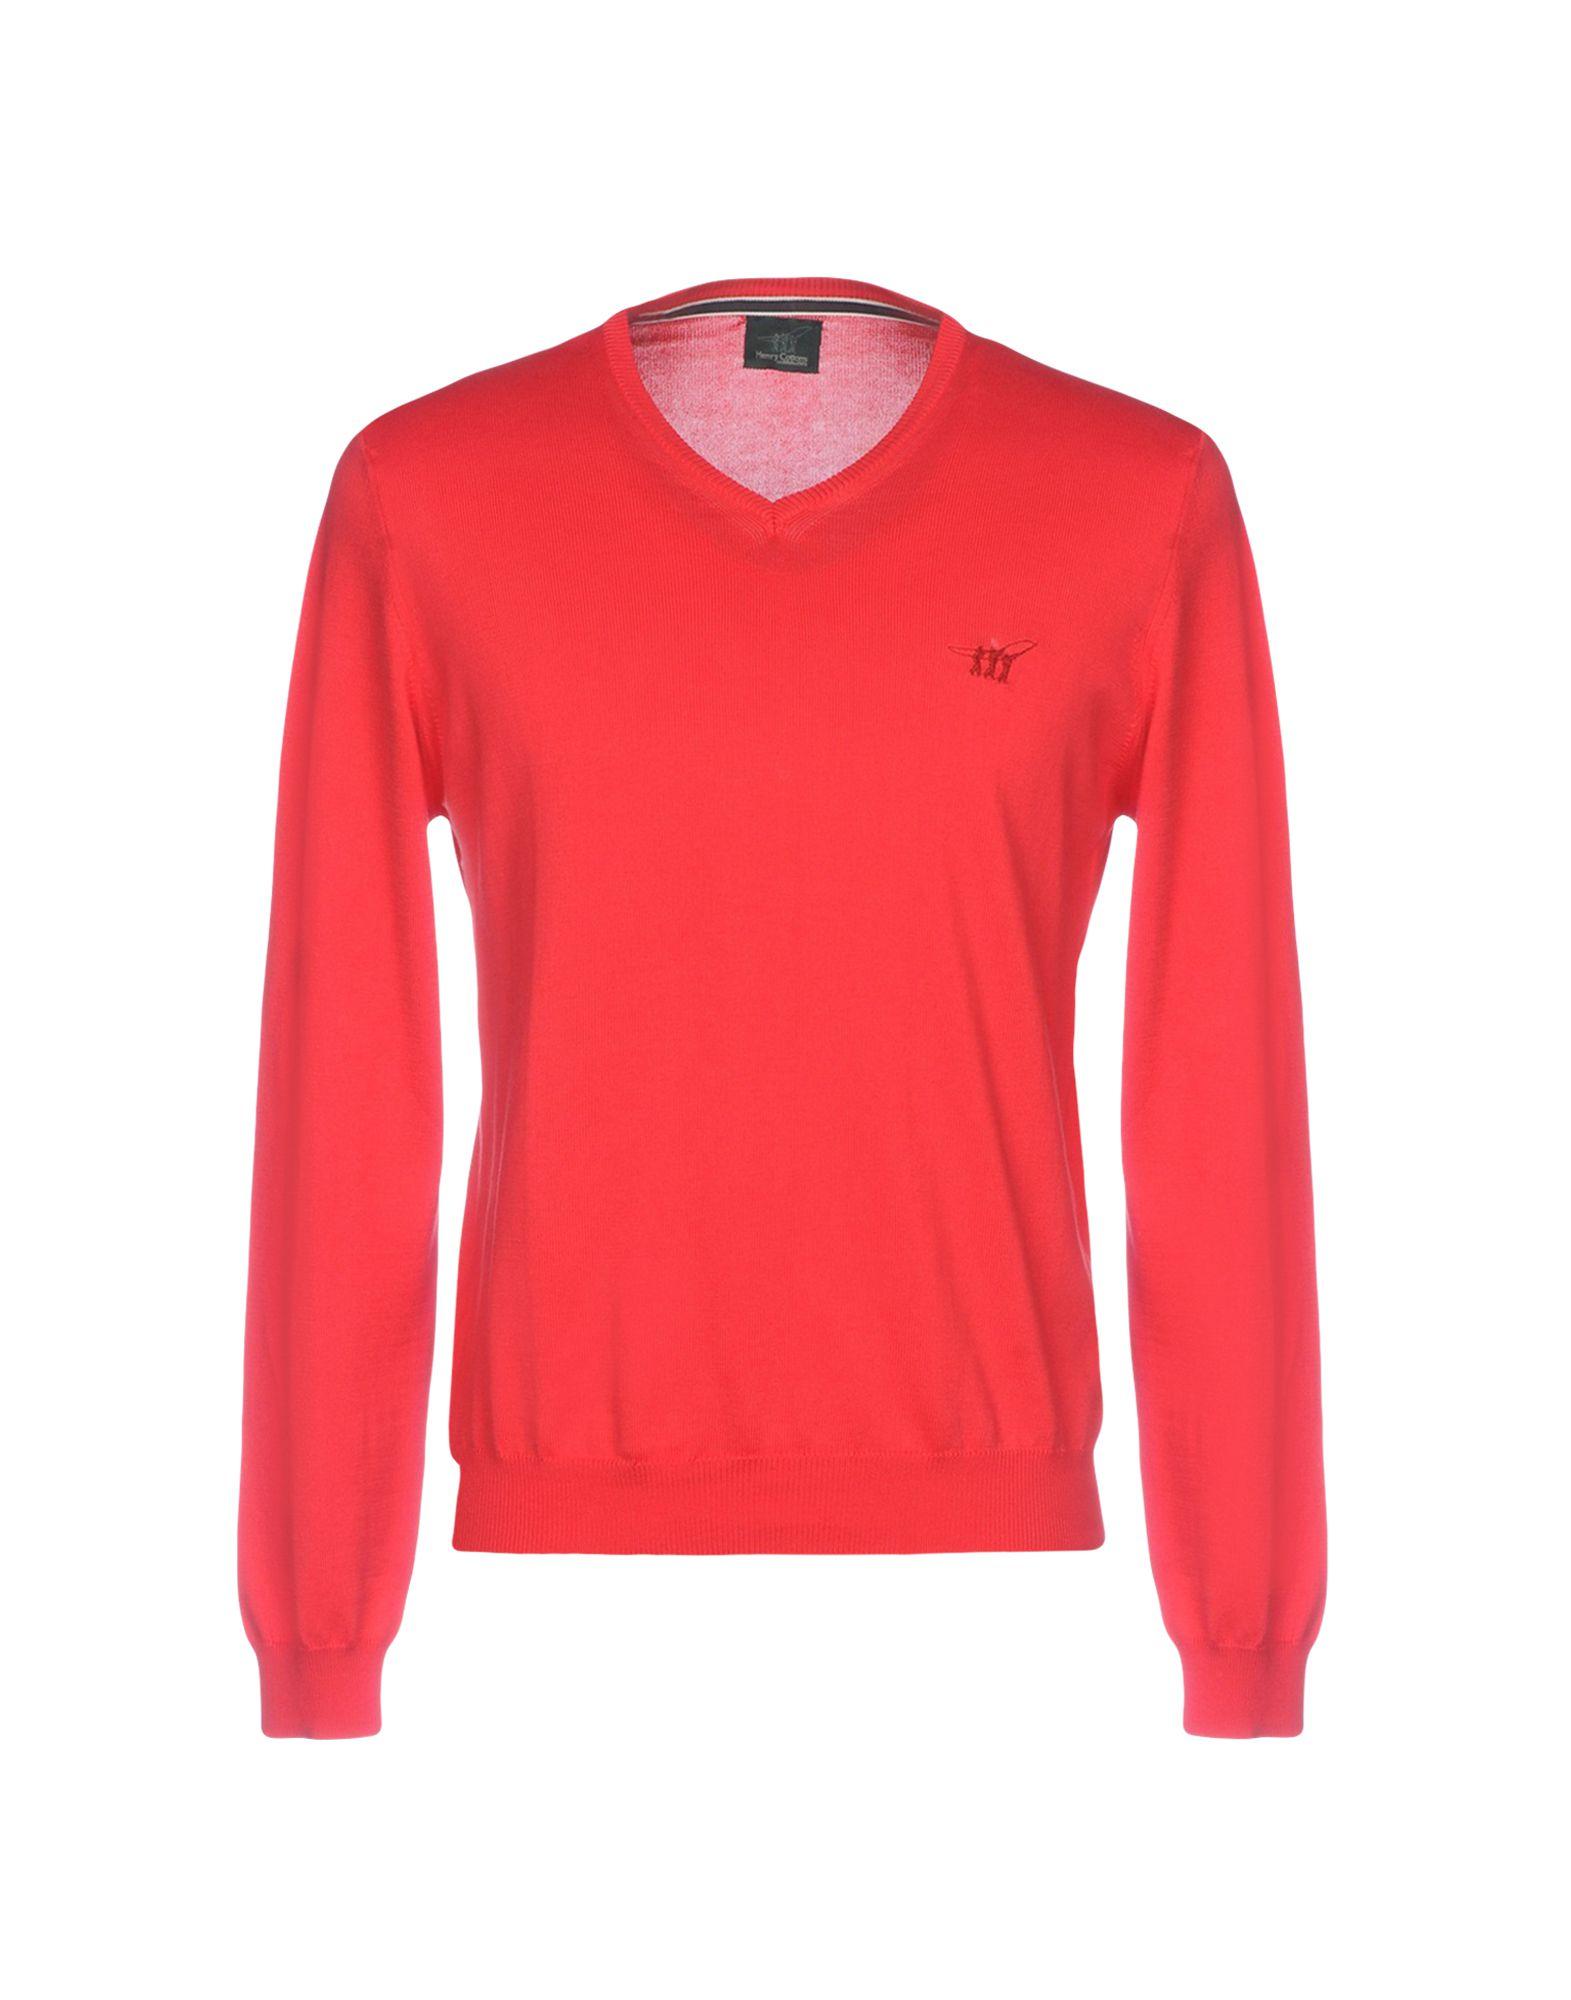 Pullover   Sweatshirts Baumwolle Henry Cotton s - Henry Cotton s Herren -  YOOX 03c0c7ef19